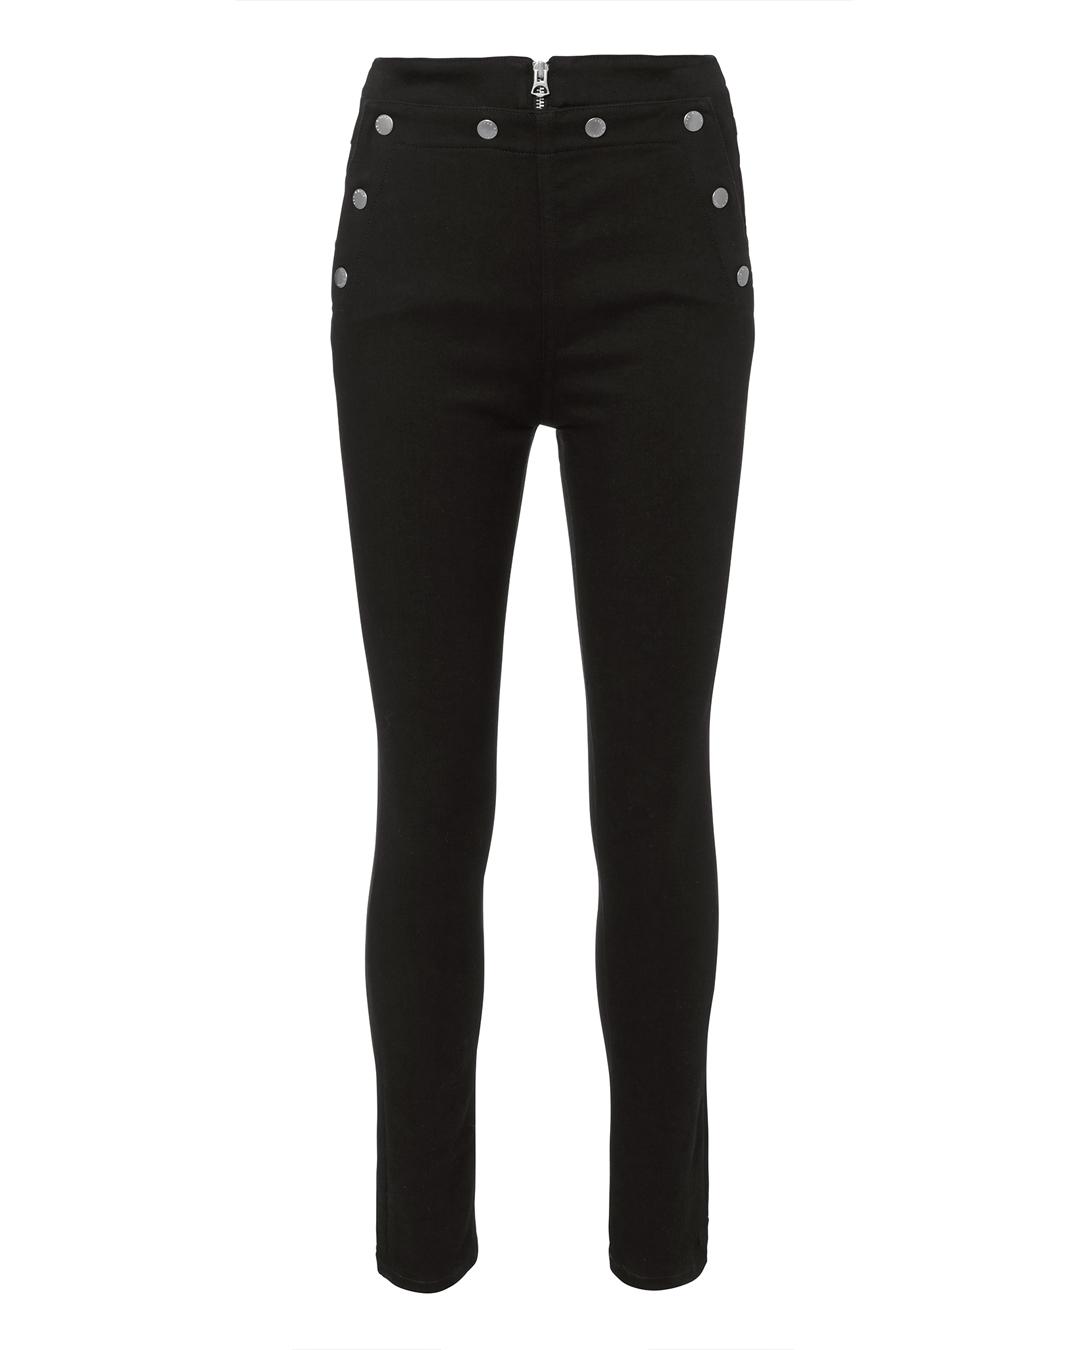 RAG & BONE/JEAN PENTON PANTS BLACK